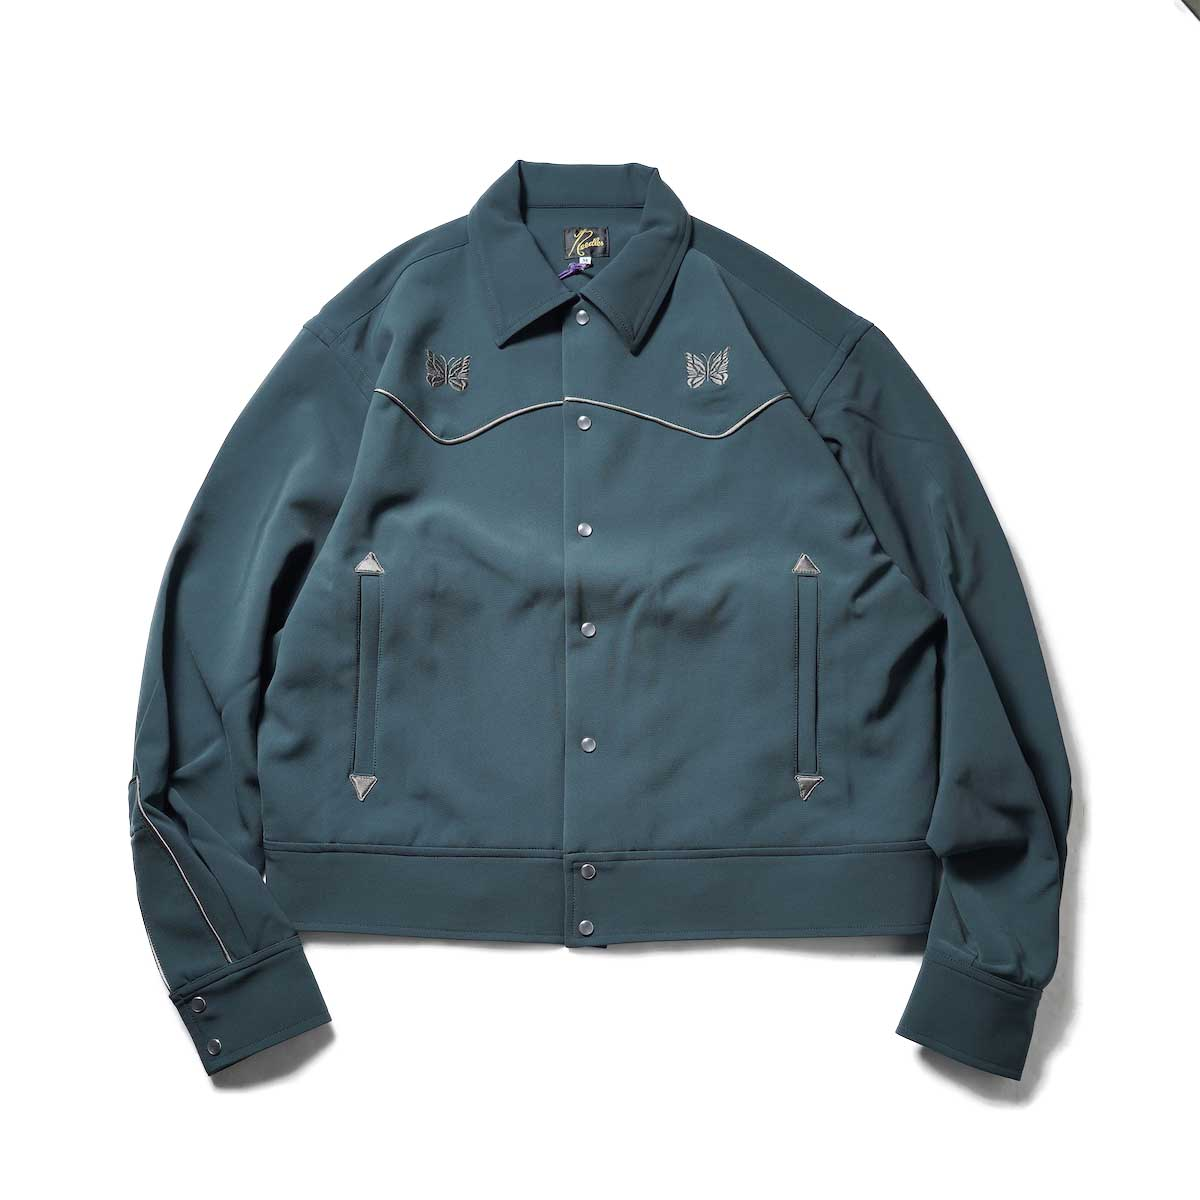 Needles / PIPING COWBOY JAC - Pe/Pu Double Cloth (Green)